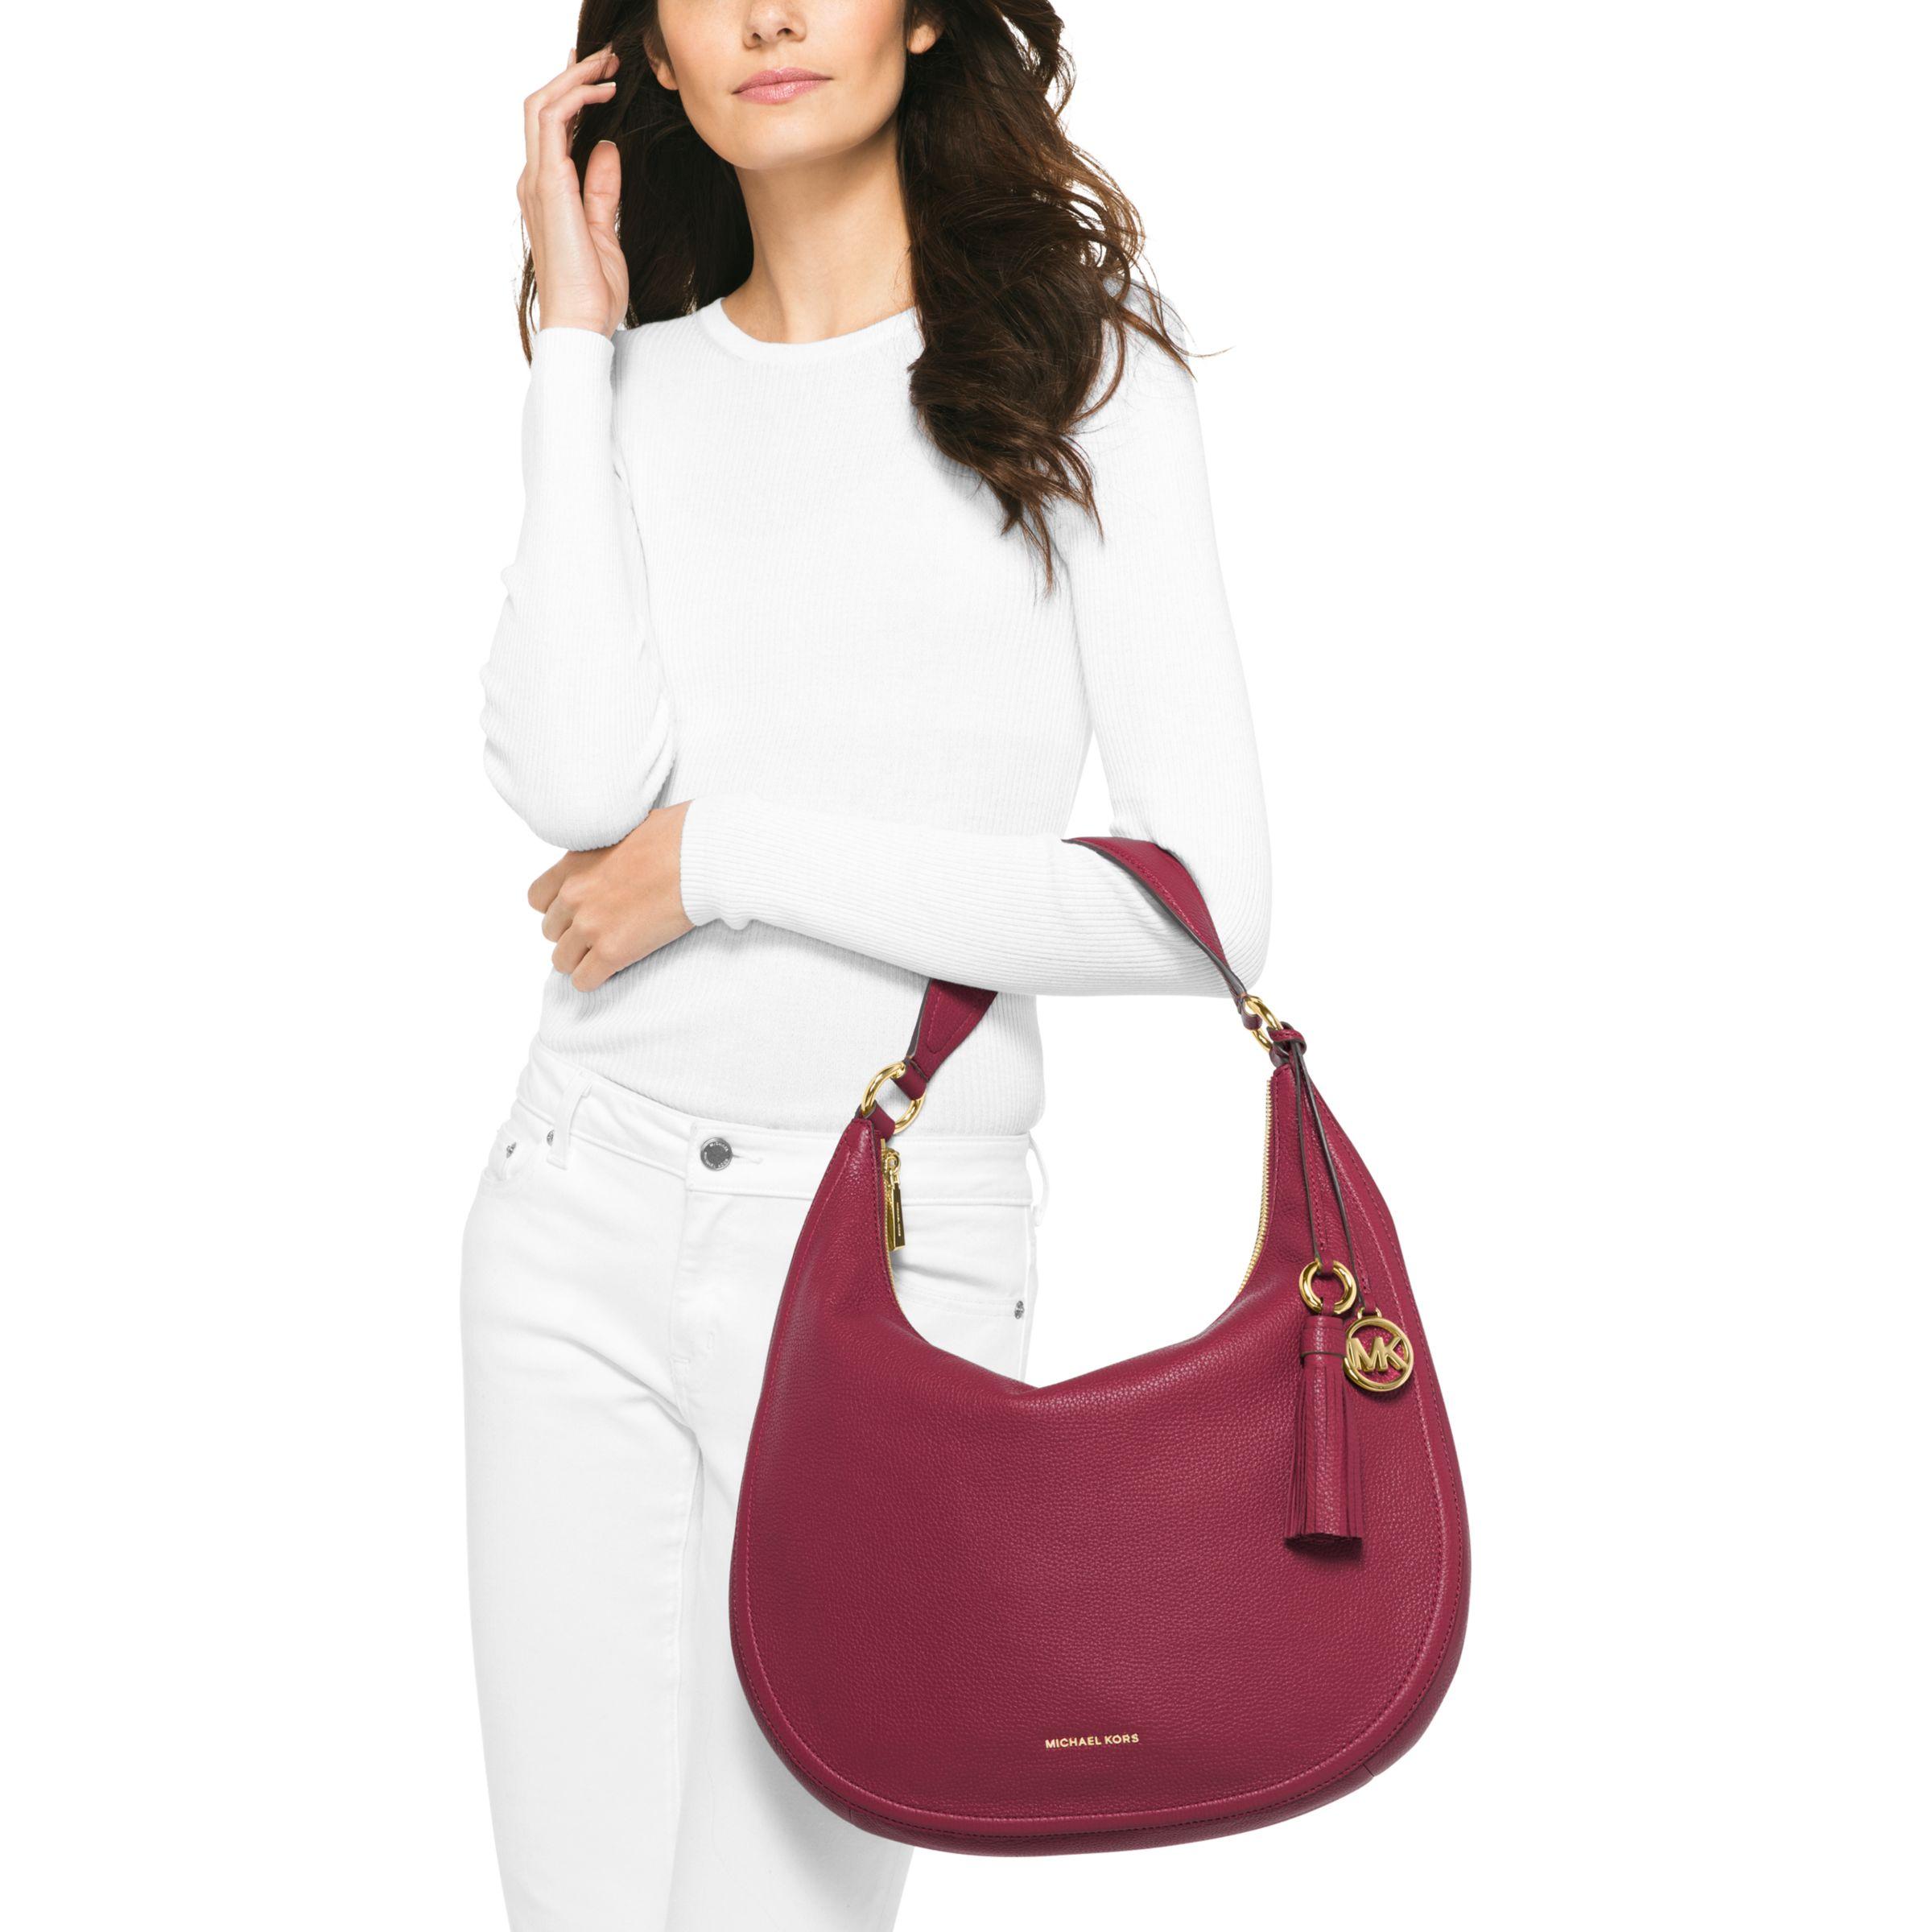 2191dfb7f3de MICHAEL Michael Kors Lydia Large Hobo Bag, Mulberry at John Lewis & Partners